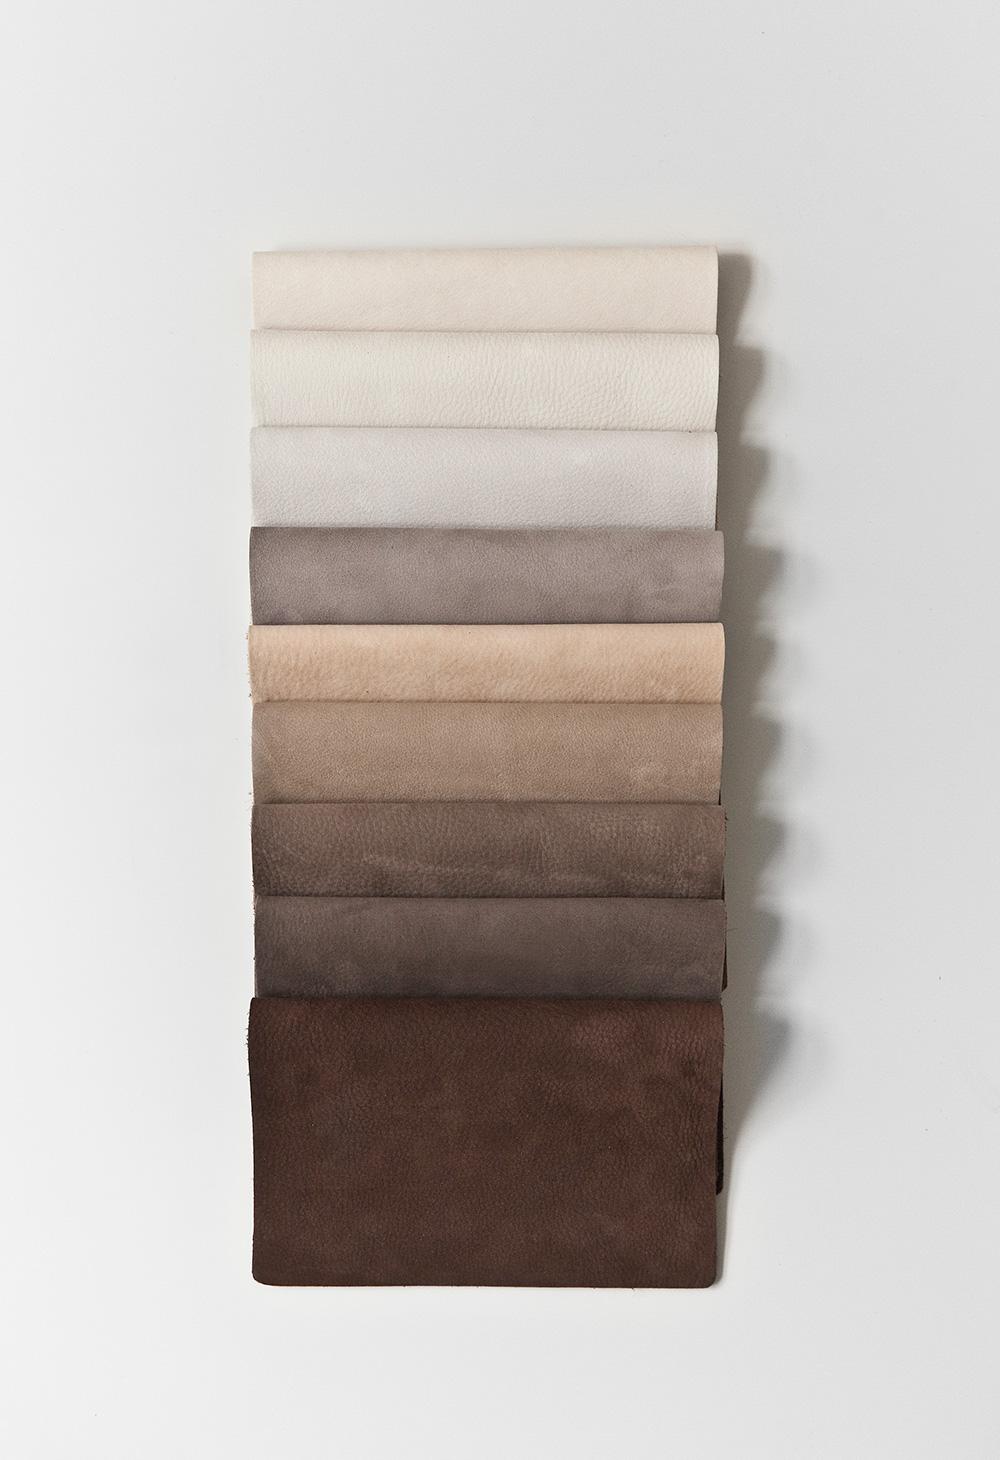 arne jacobsen swan chair best ergonomic task 2016 collections | sorensen leather